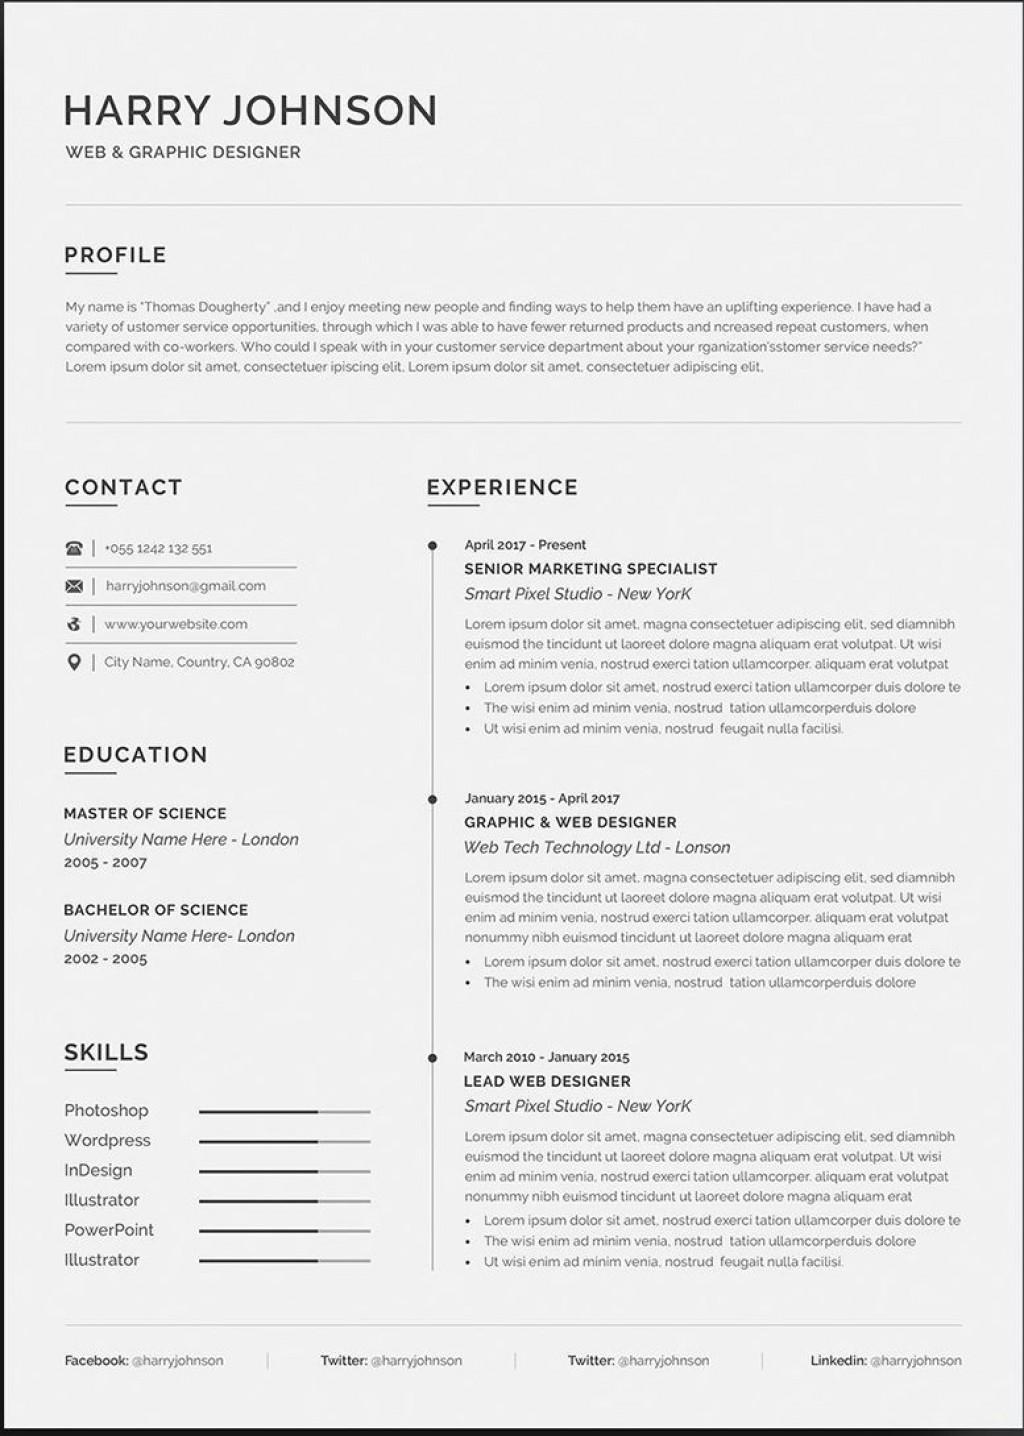 004 Amazing Microsoft Word Resume Template High Resolution  Reddit 2019 2010 Free DownloadLarge